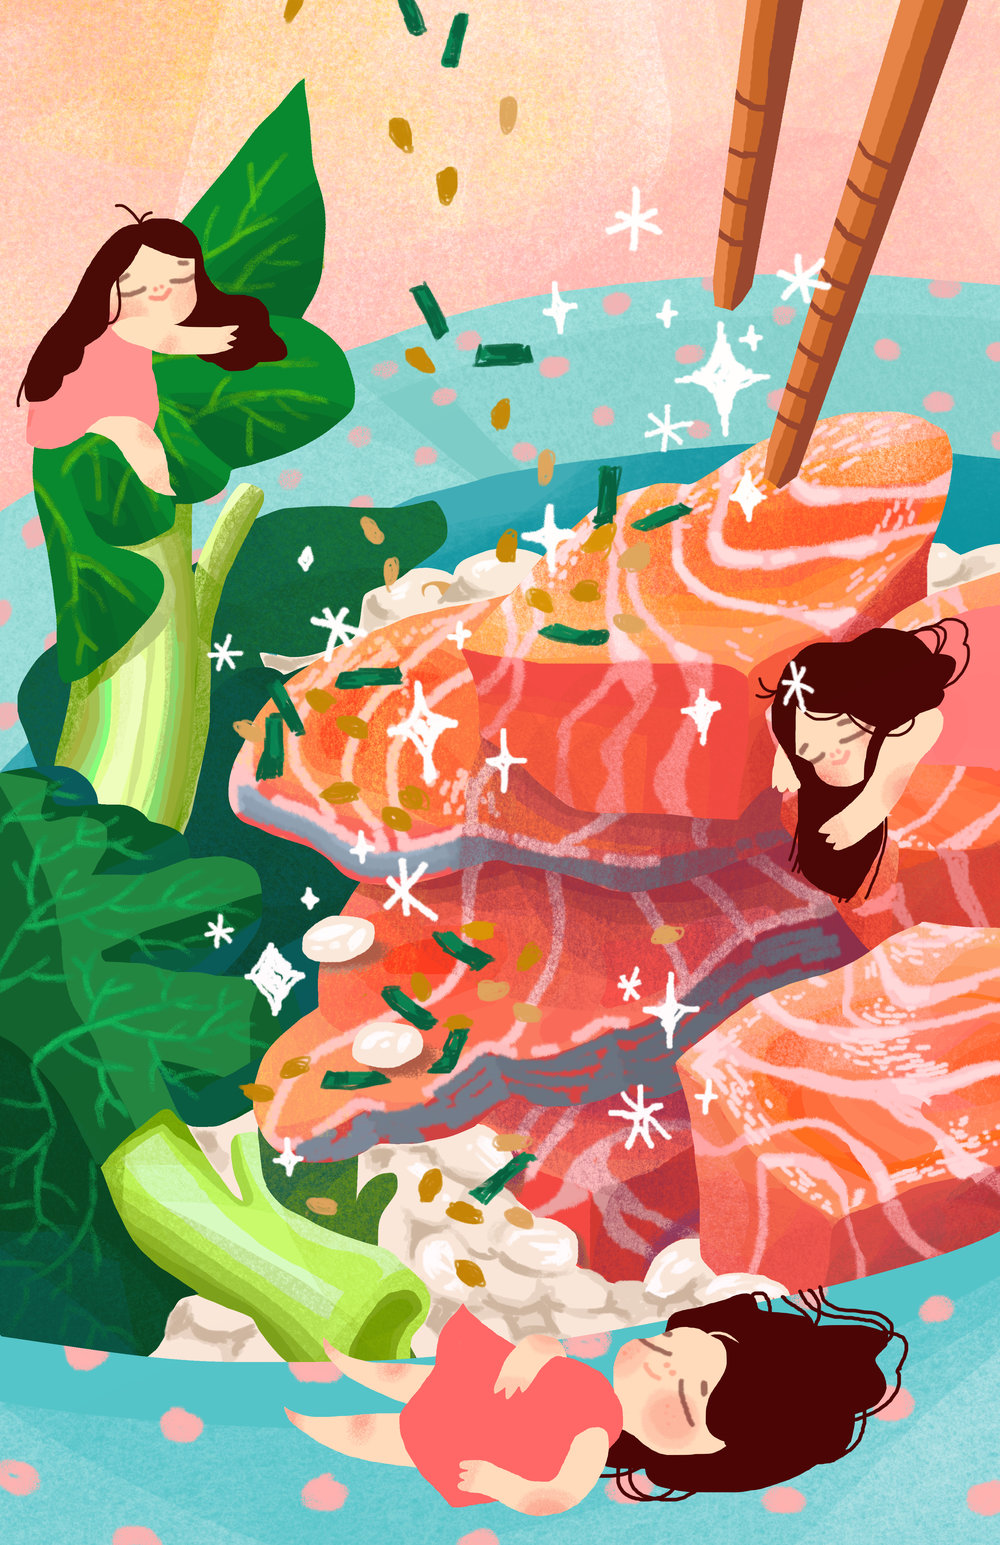 Artwork by Subin Yang